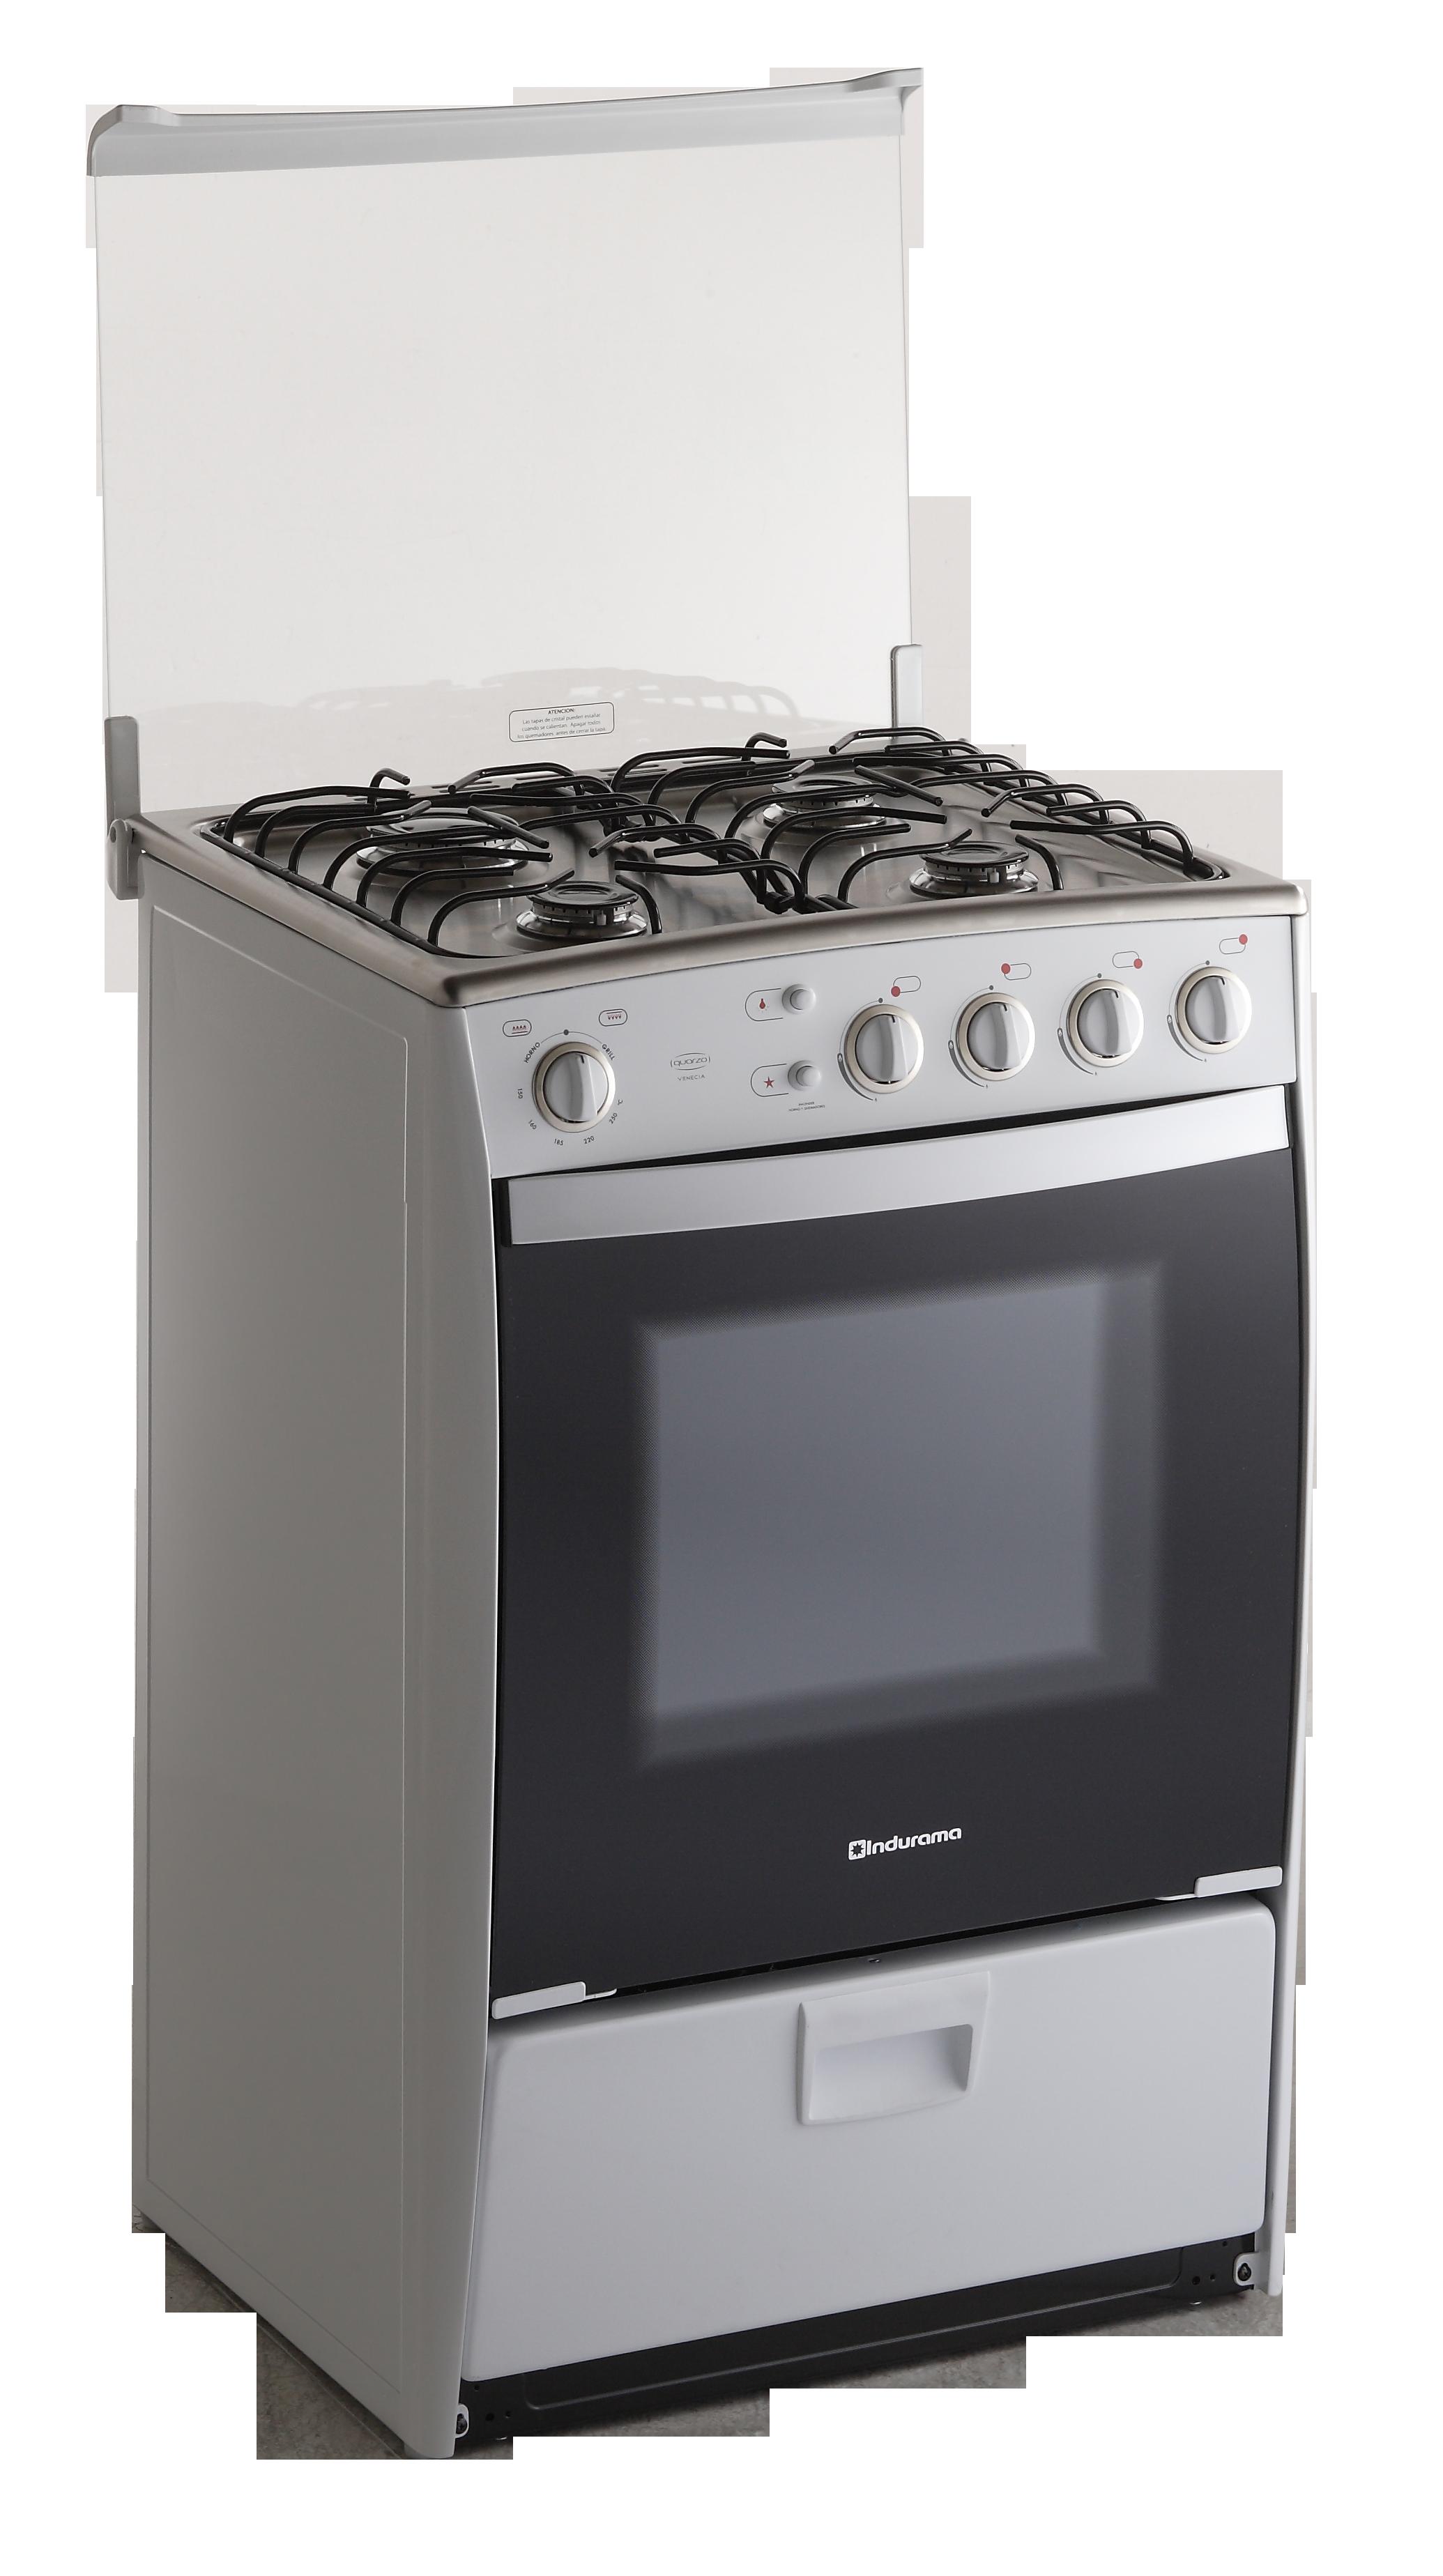 Venecia Quarzo De Indurama 4 Quemadores 24 Pulgadas Blanco Alto 94 Cm Ancho 60 Cm Prof 58 Cm Parrila Autodesli Kitchen Appliances Kitchen Oven